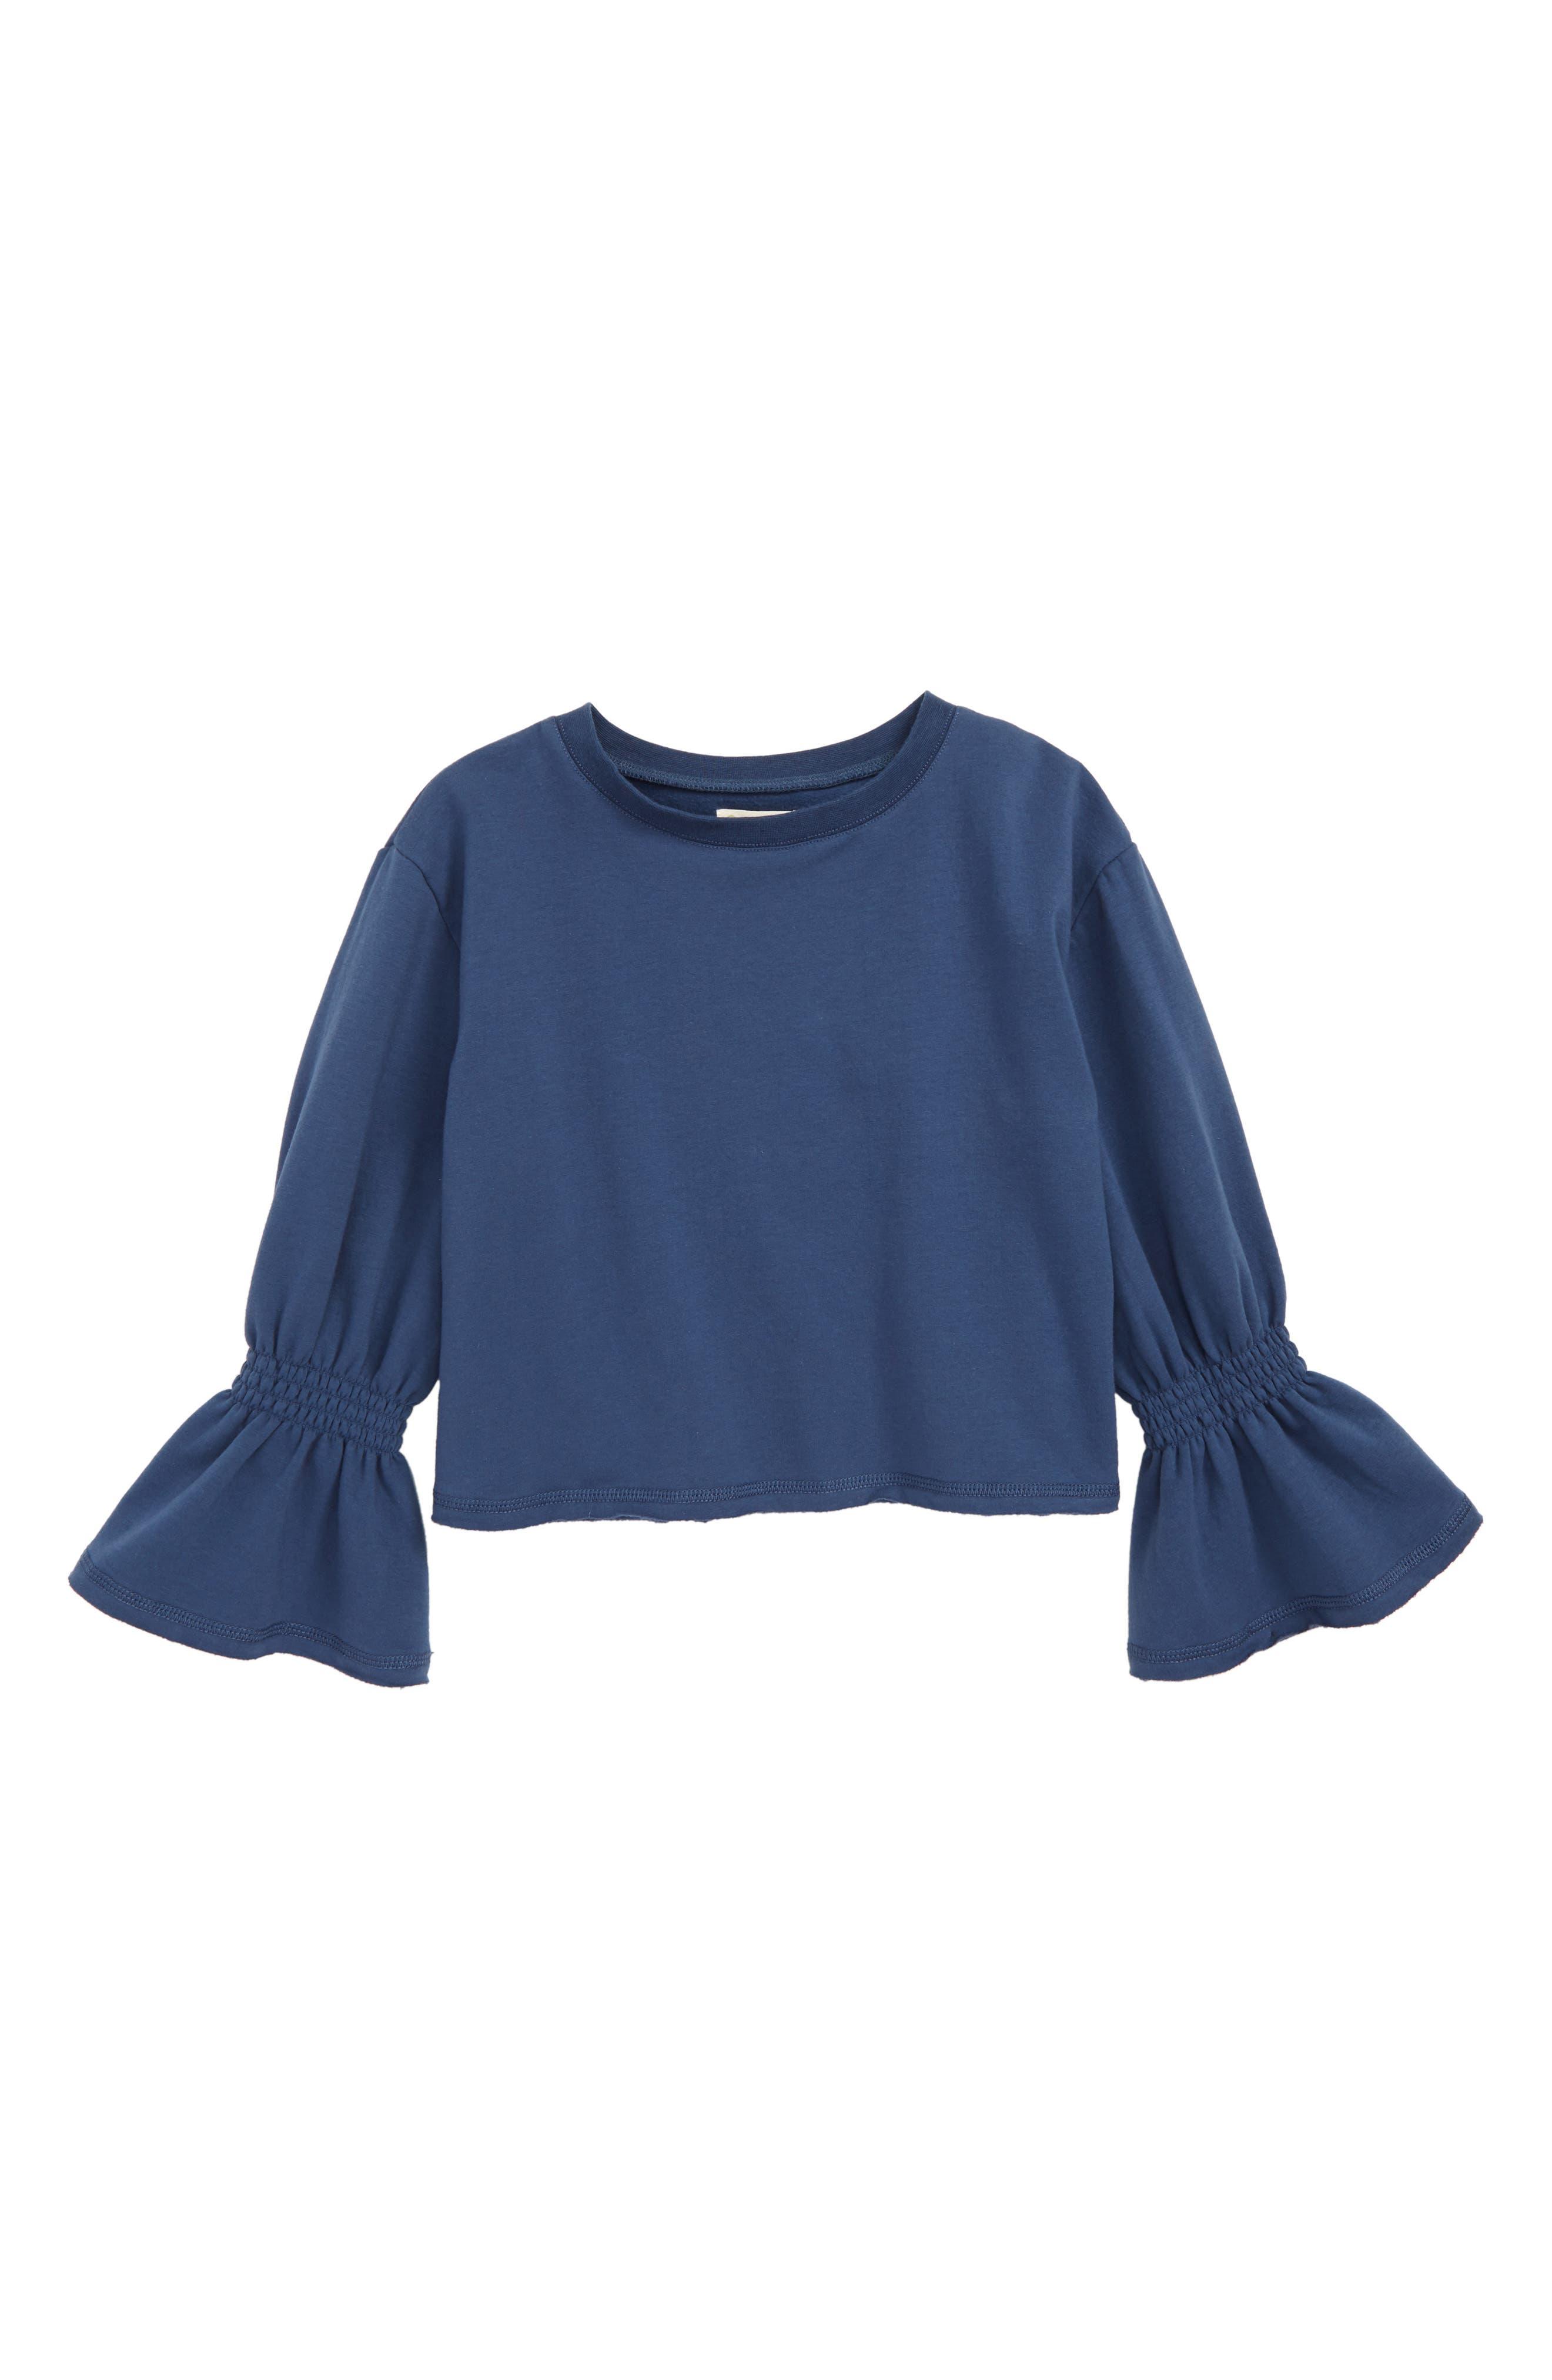 Fleece Flare Sleeve Top,                             Main thumbnail 1, color,                             NAVY DENIM